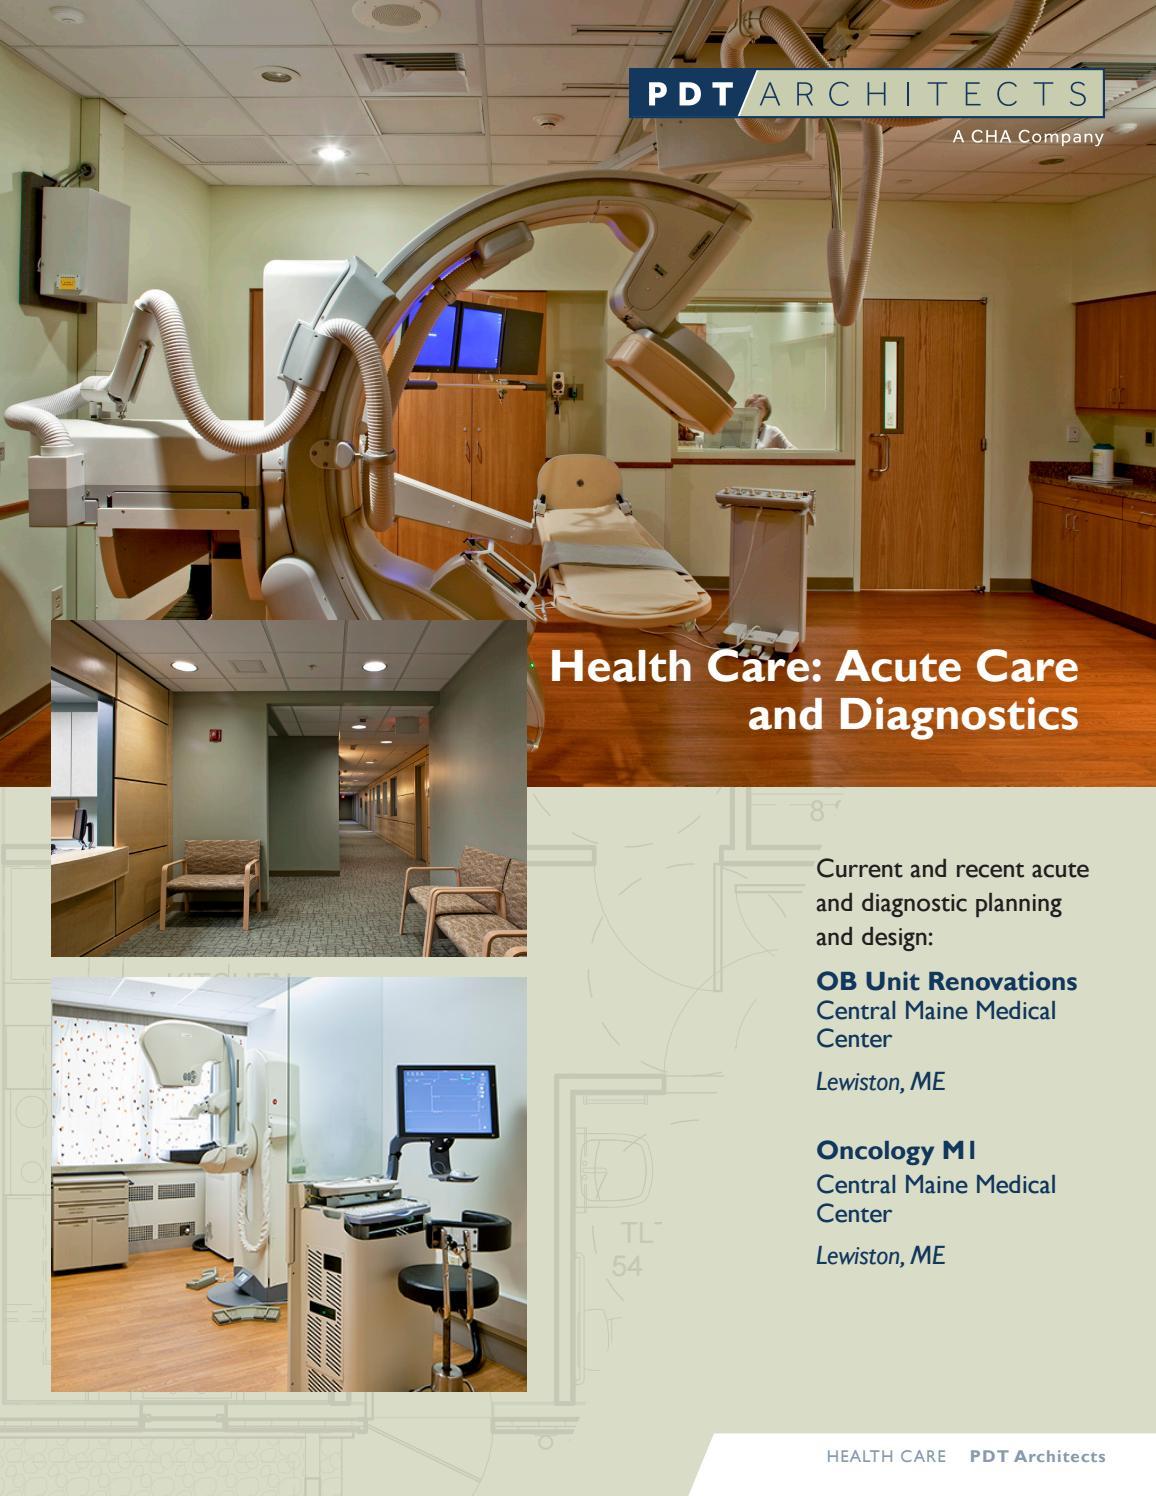 Health care acute care diagnostics brochure by PDT